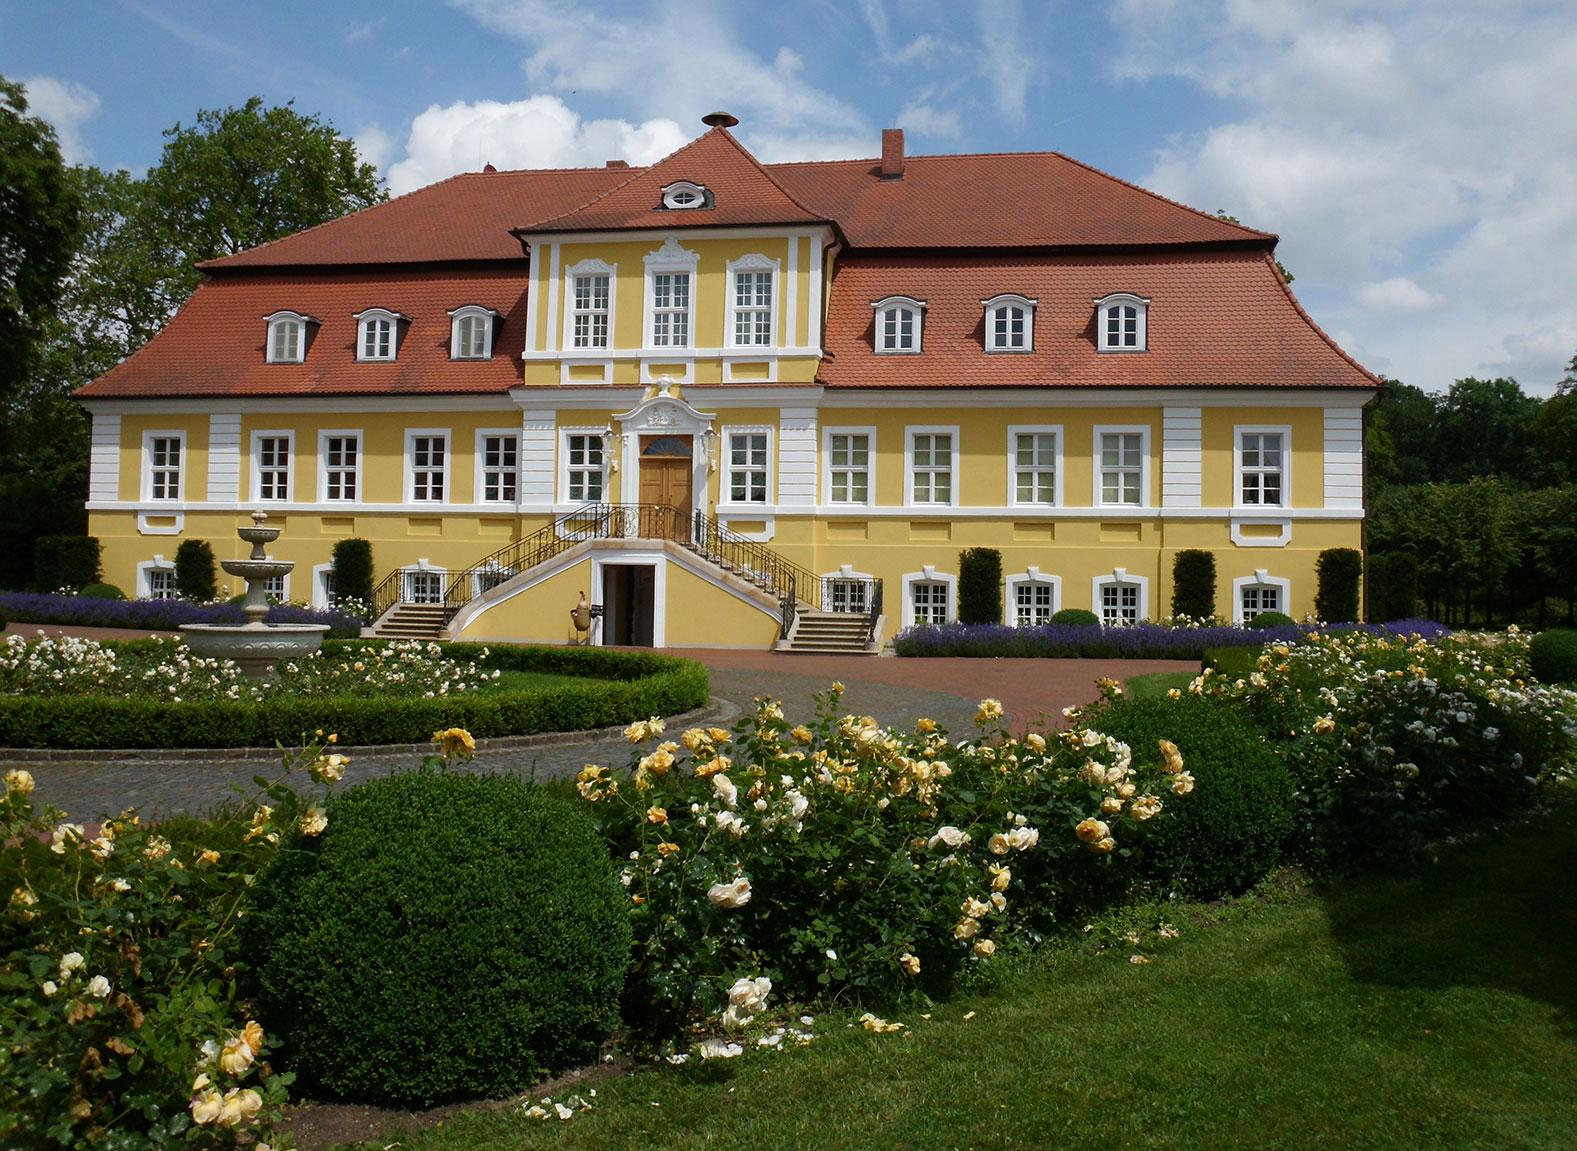 LebensArt Schloss Döbbelin